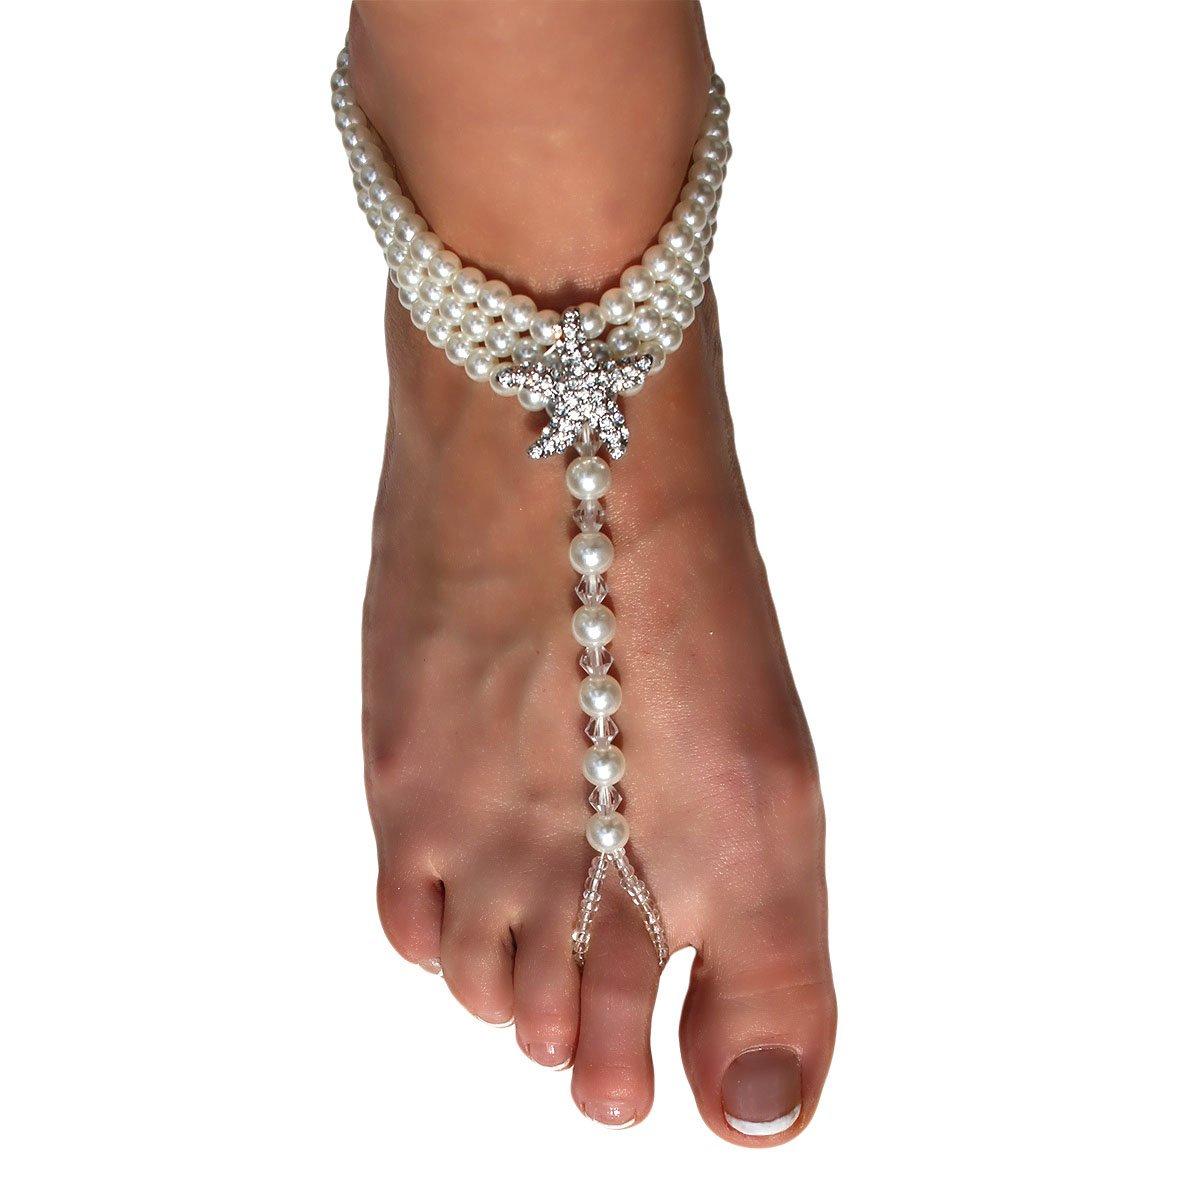 Ivory Beach Wedding Barefoot Sandals - Beaded Pearl Anklet with Rhinestone Starfish - Destination Wedding Ankle Bracelets - Set of 2